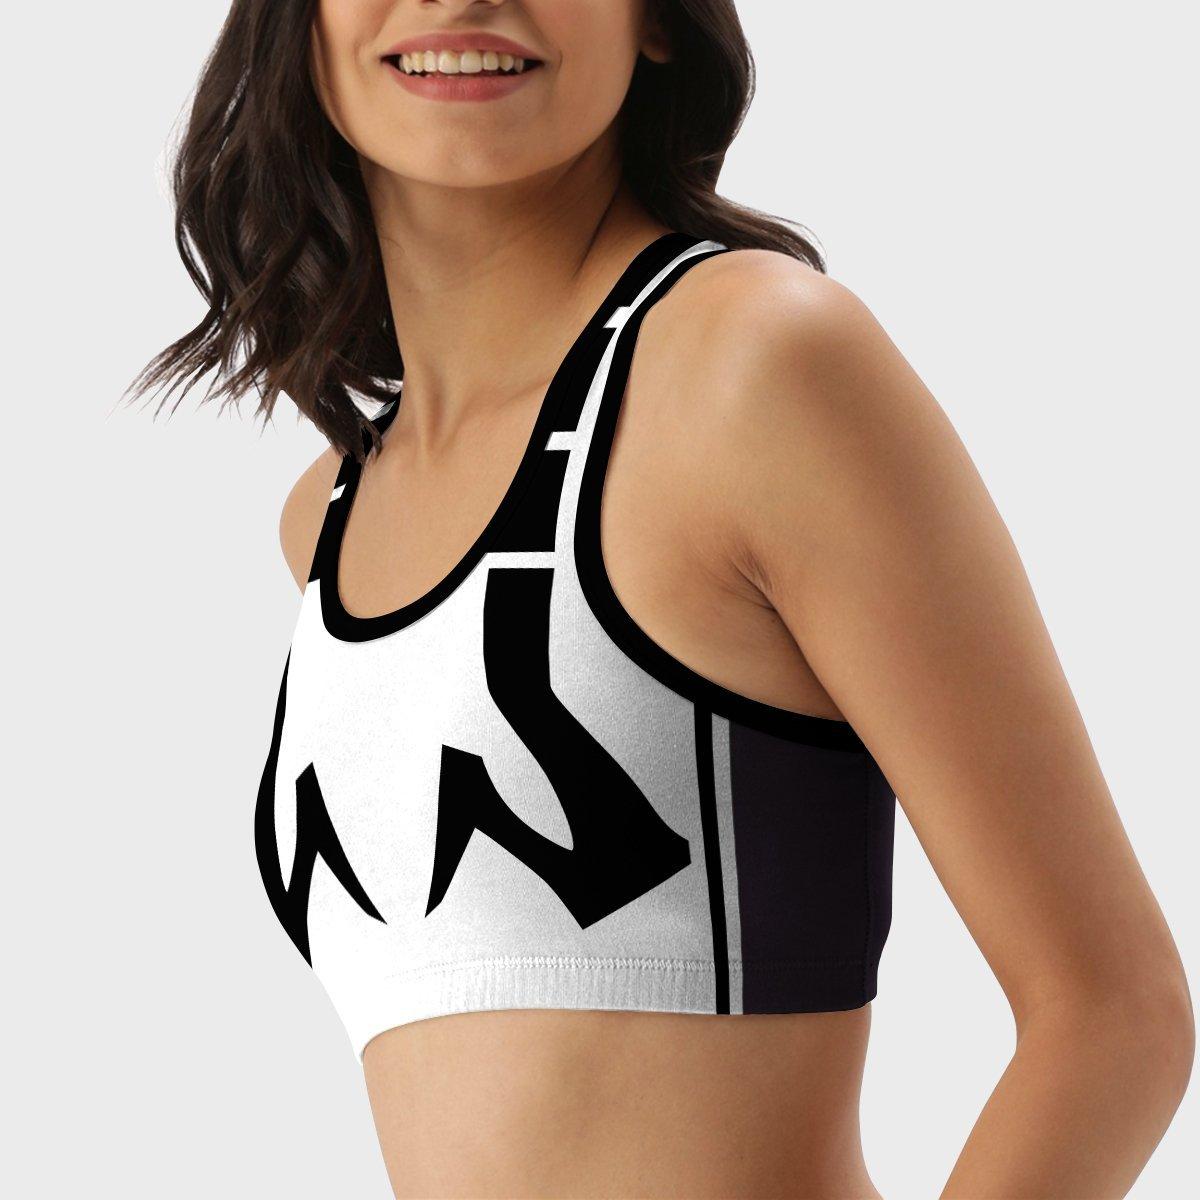 legend sukuna active wear set 633700 - Anime Swimsuits